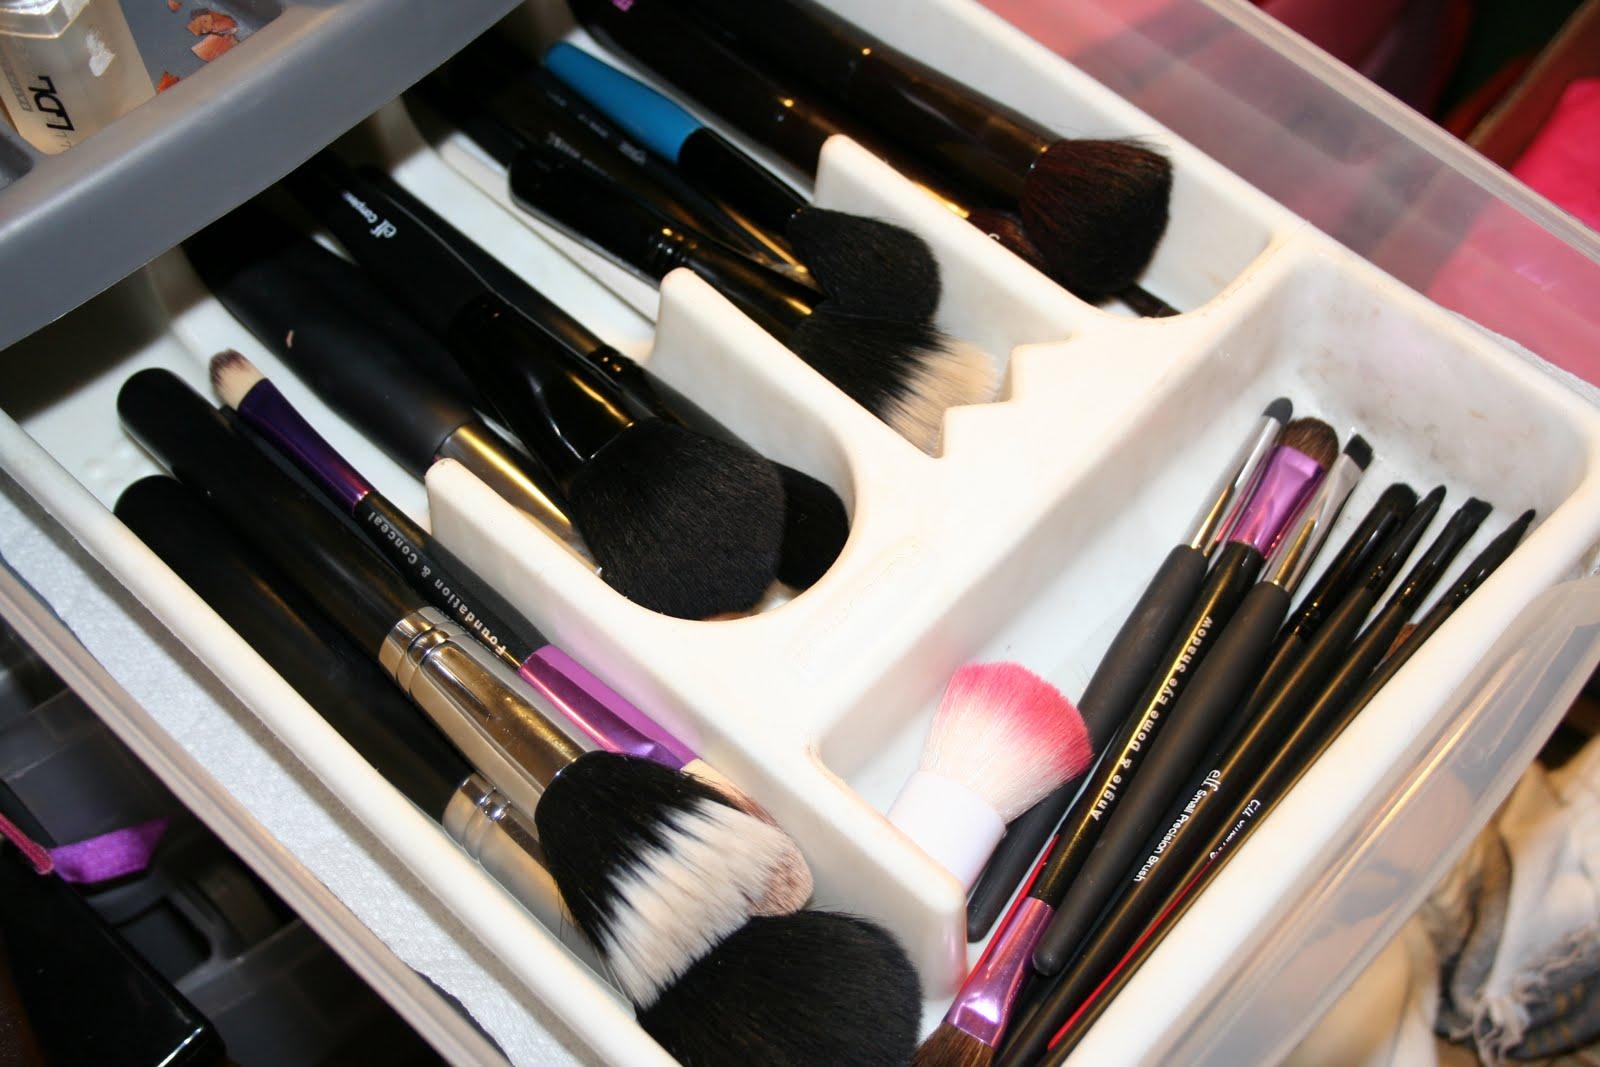 система ранения кистей для макияжа